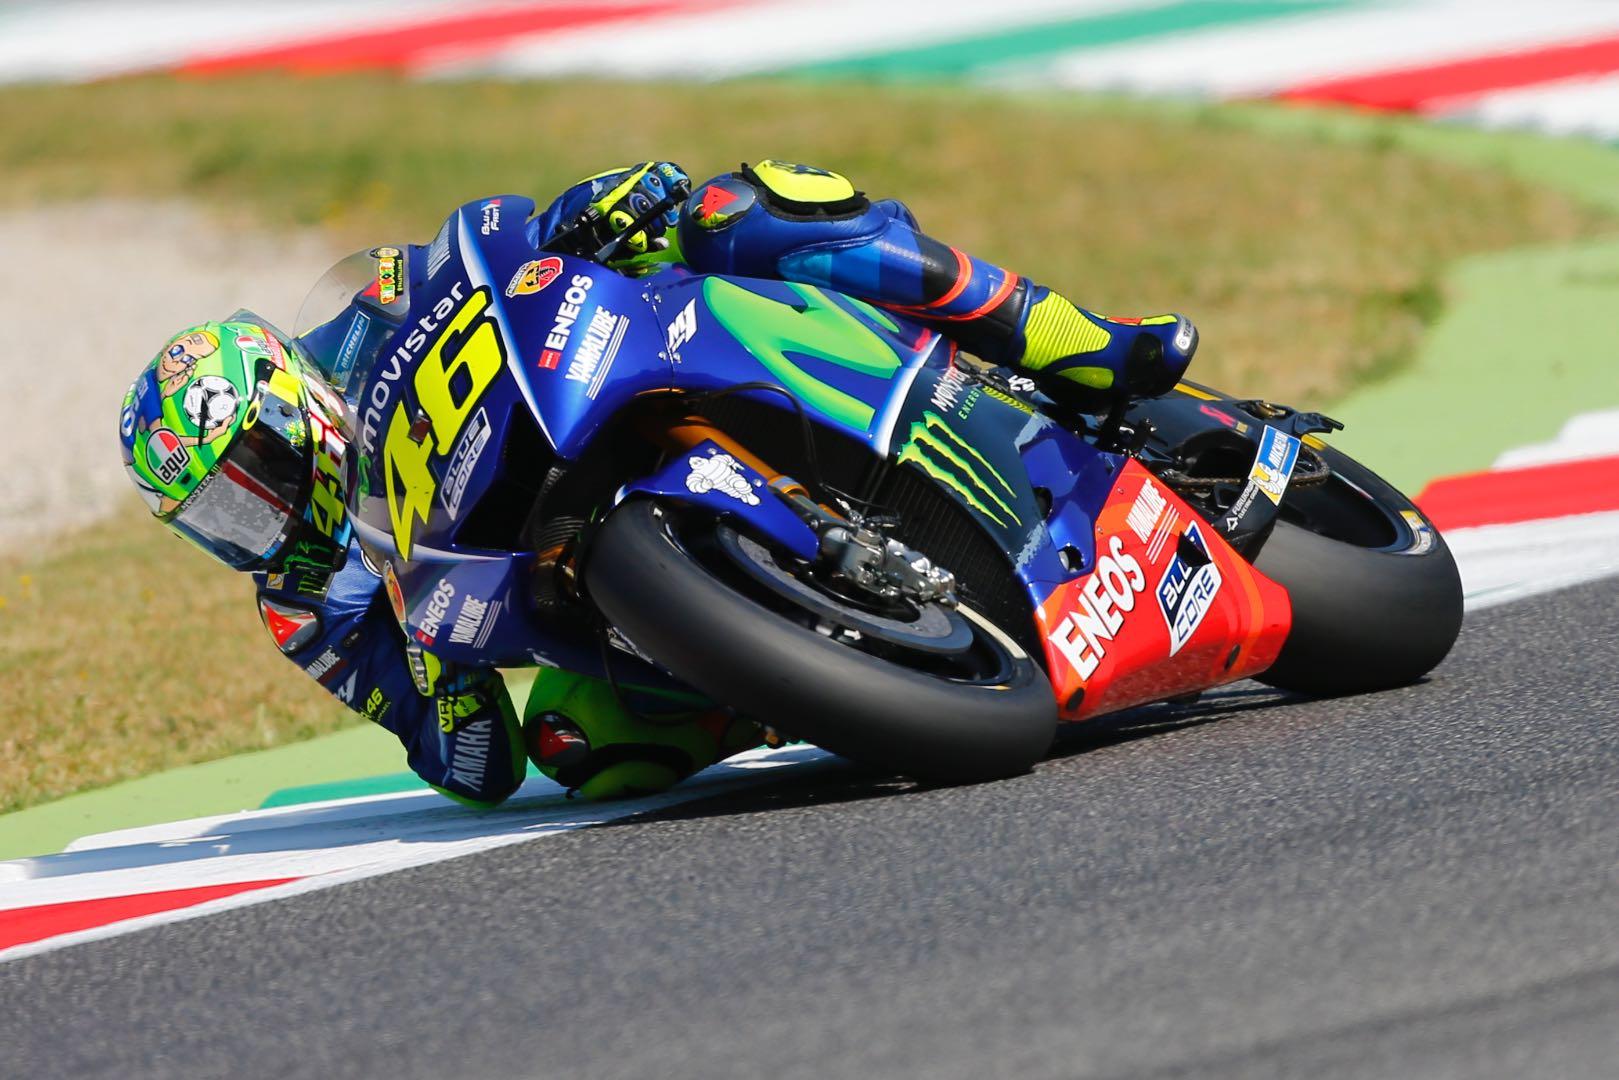 2019 MotoGP Preseason Test Schedule Calendar dates